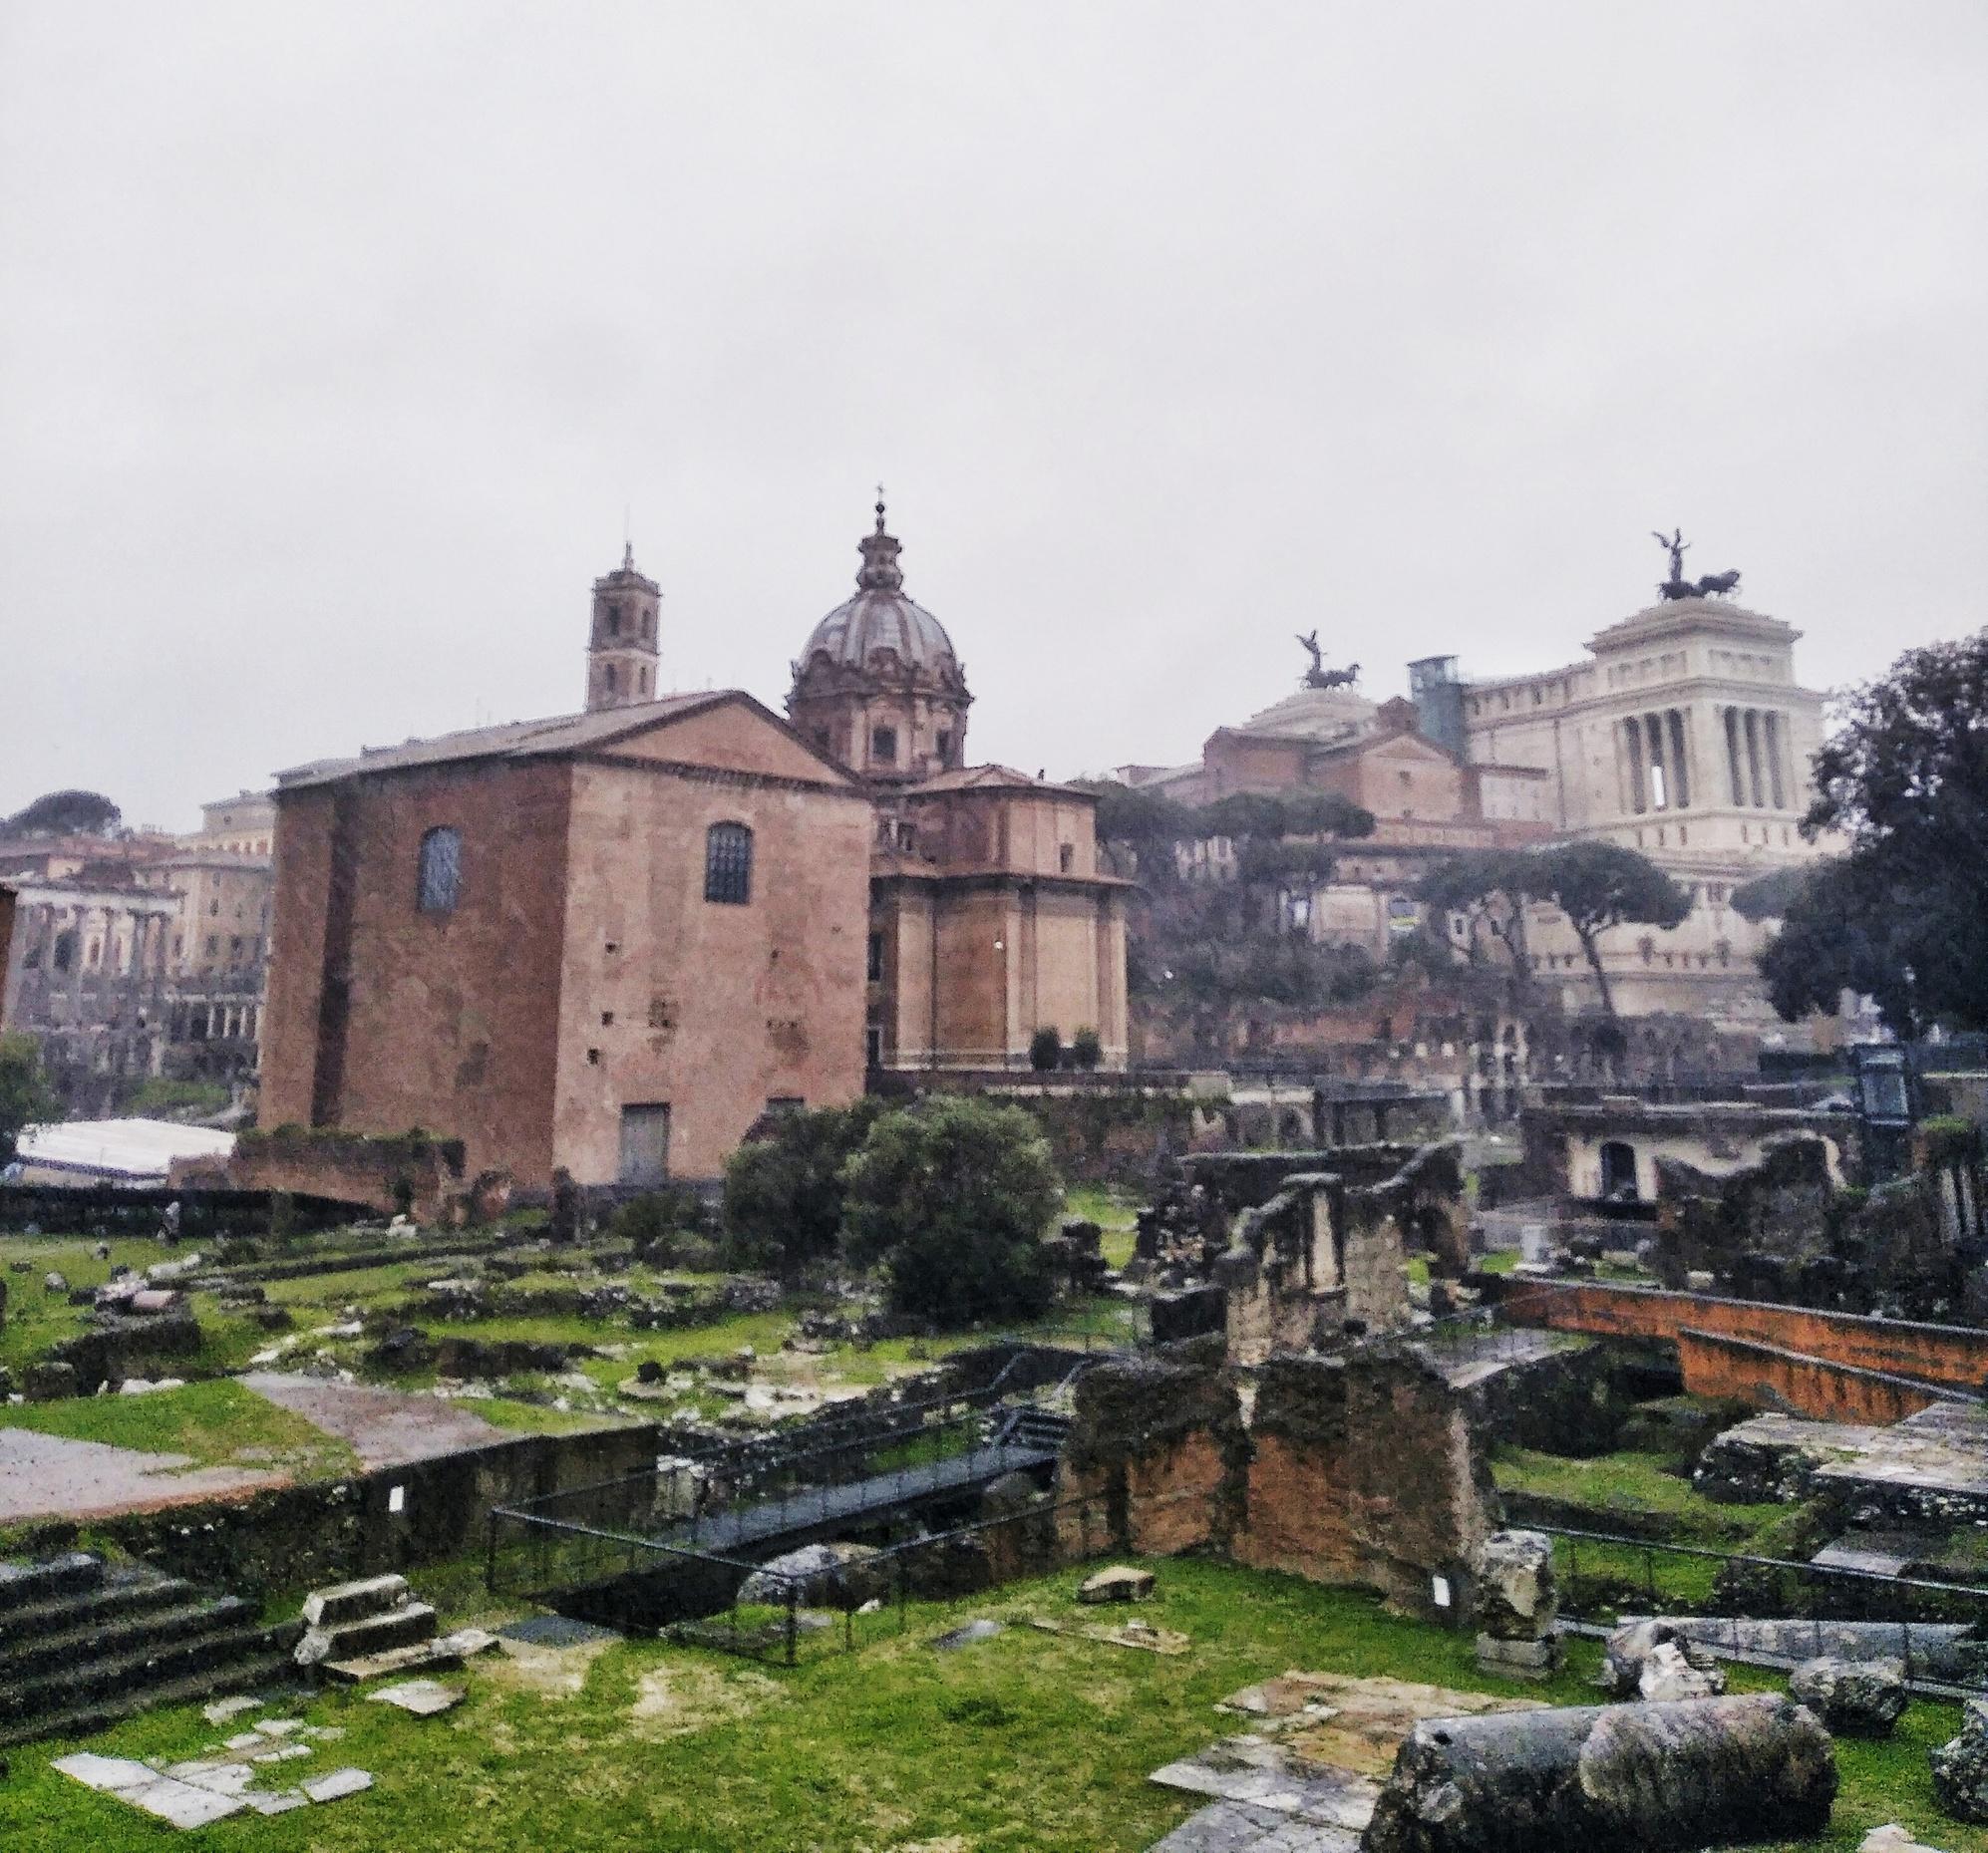 Рим: взгляд на Вечный город под другим углом Рим: взгляд на Вечный город под другим углом IMG 20180409 112502 01